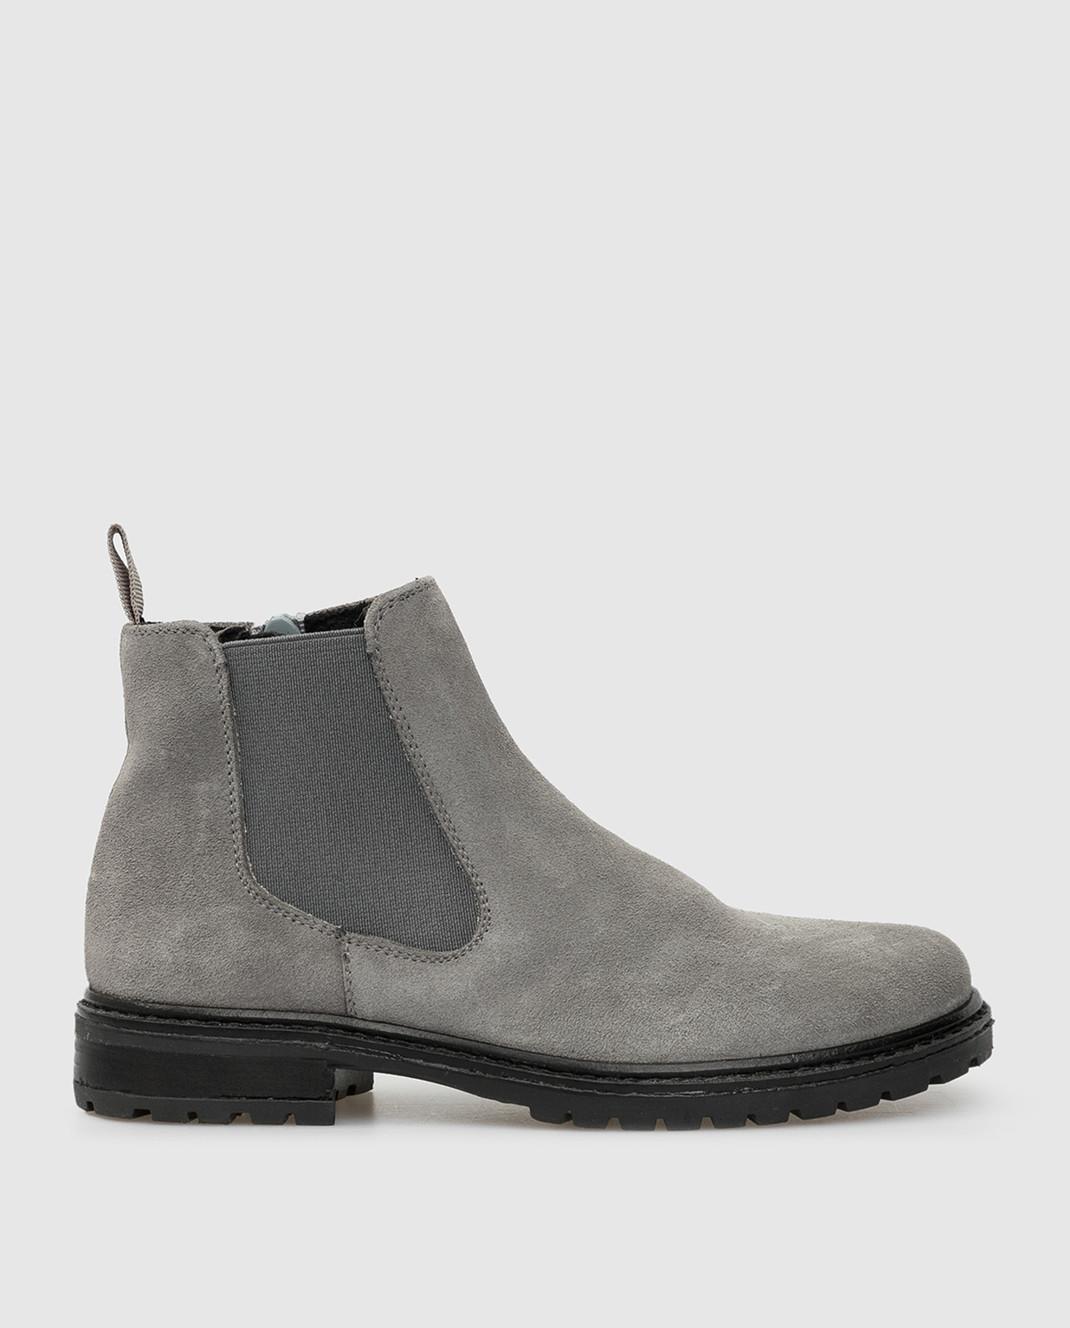 Zecchino D'oro Детские серые замшевые ботинки F0242003032